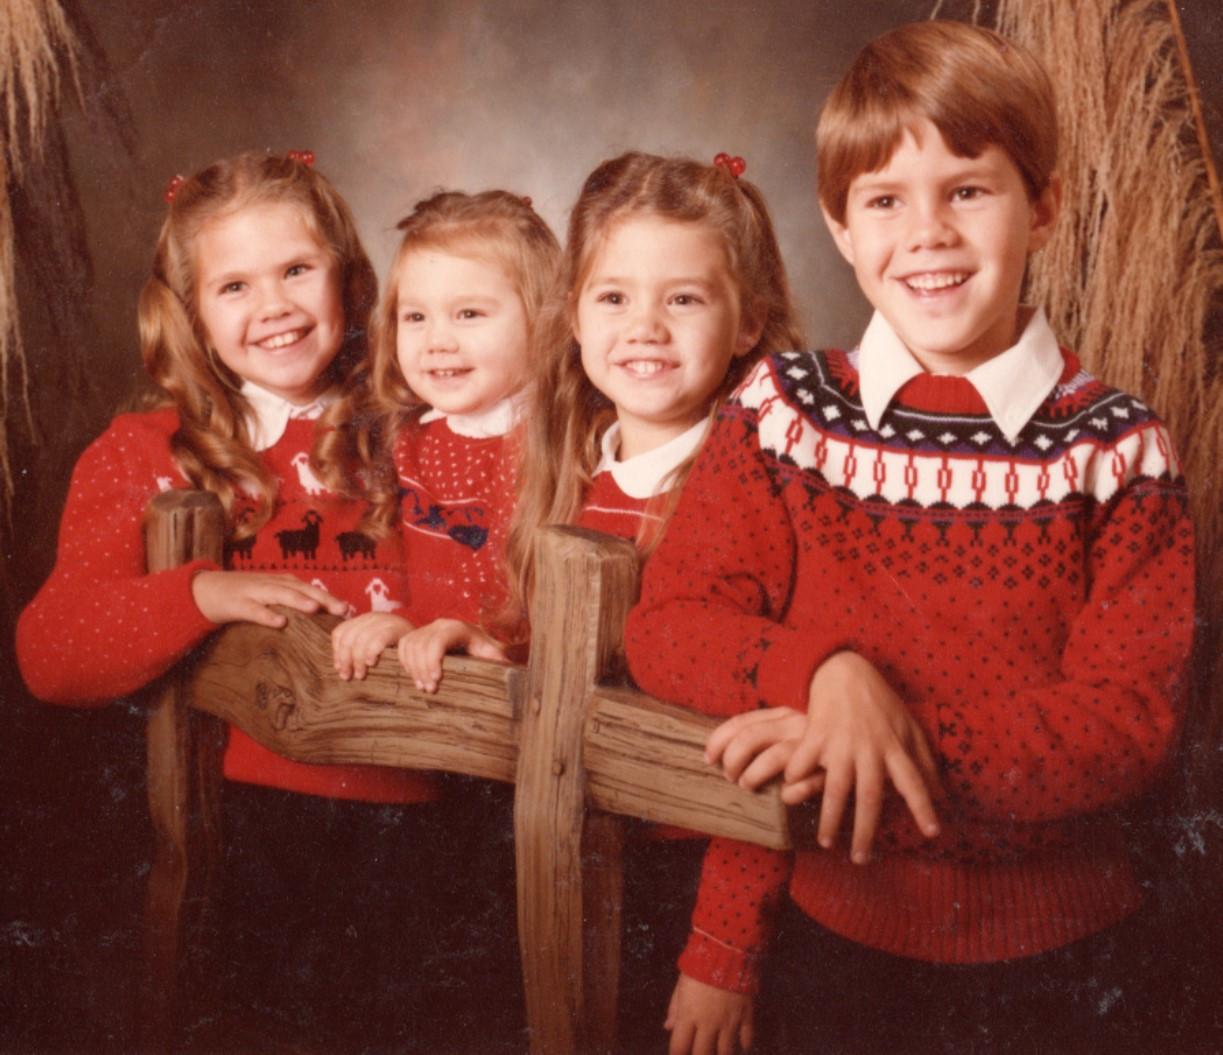 ry lis meg h red sweaters.jpg